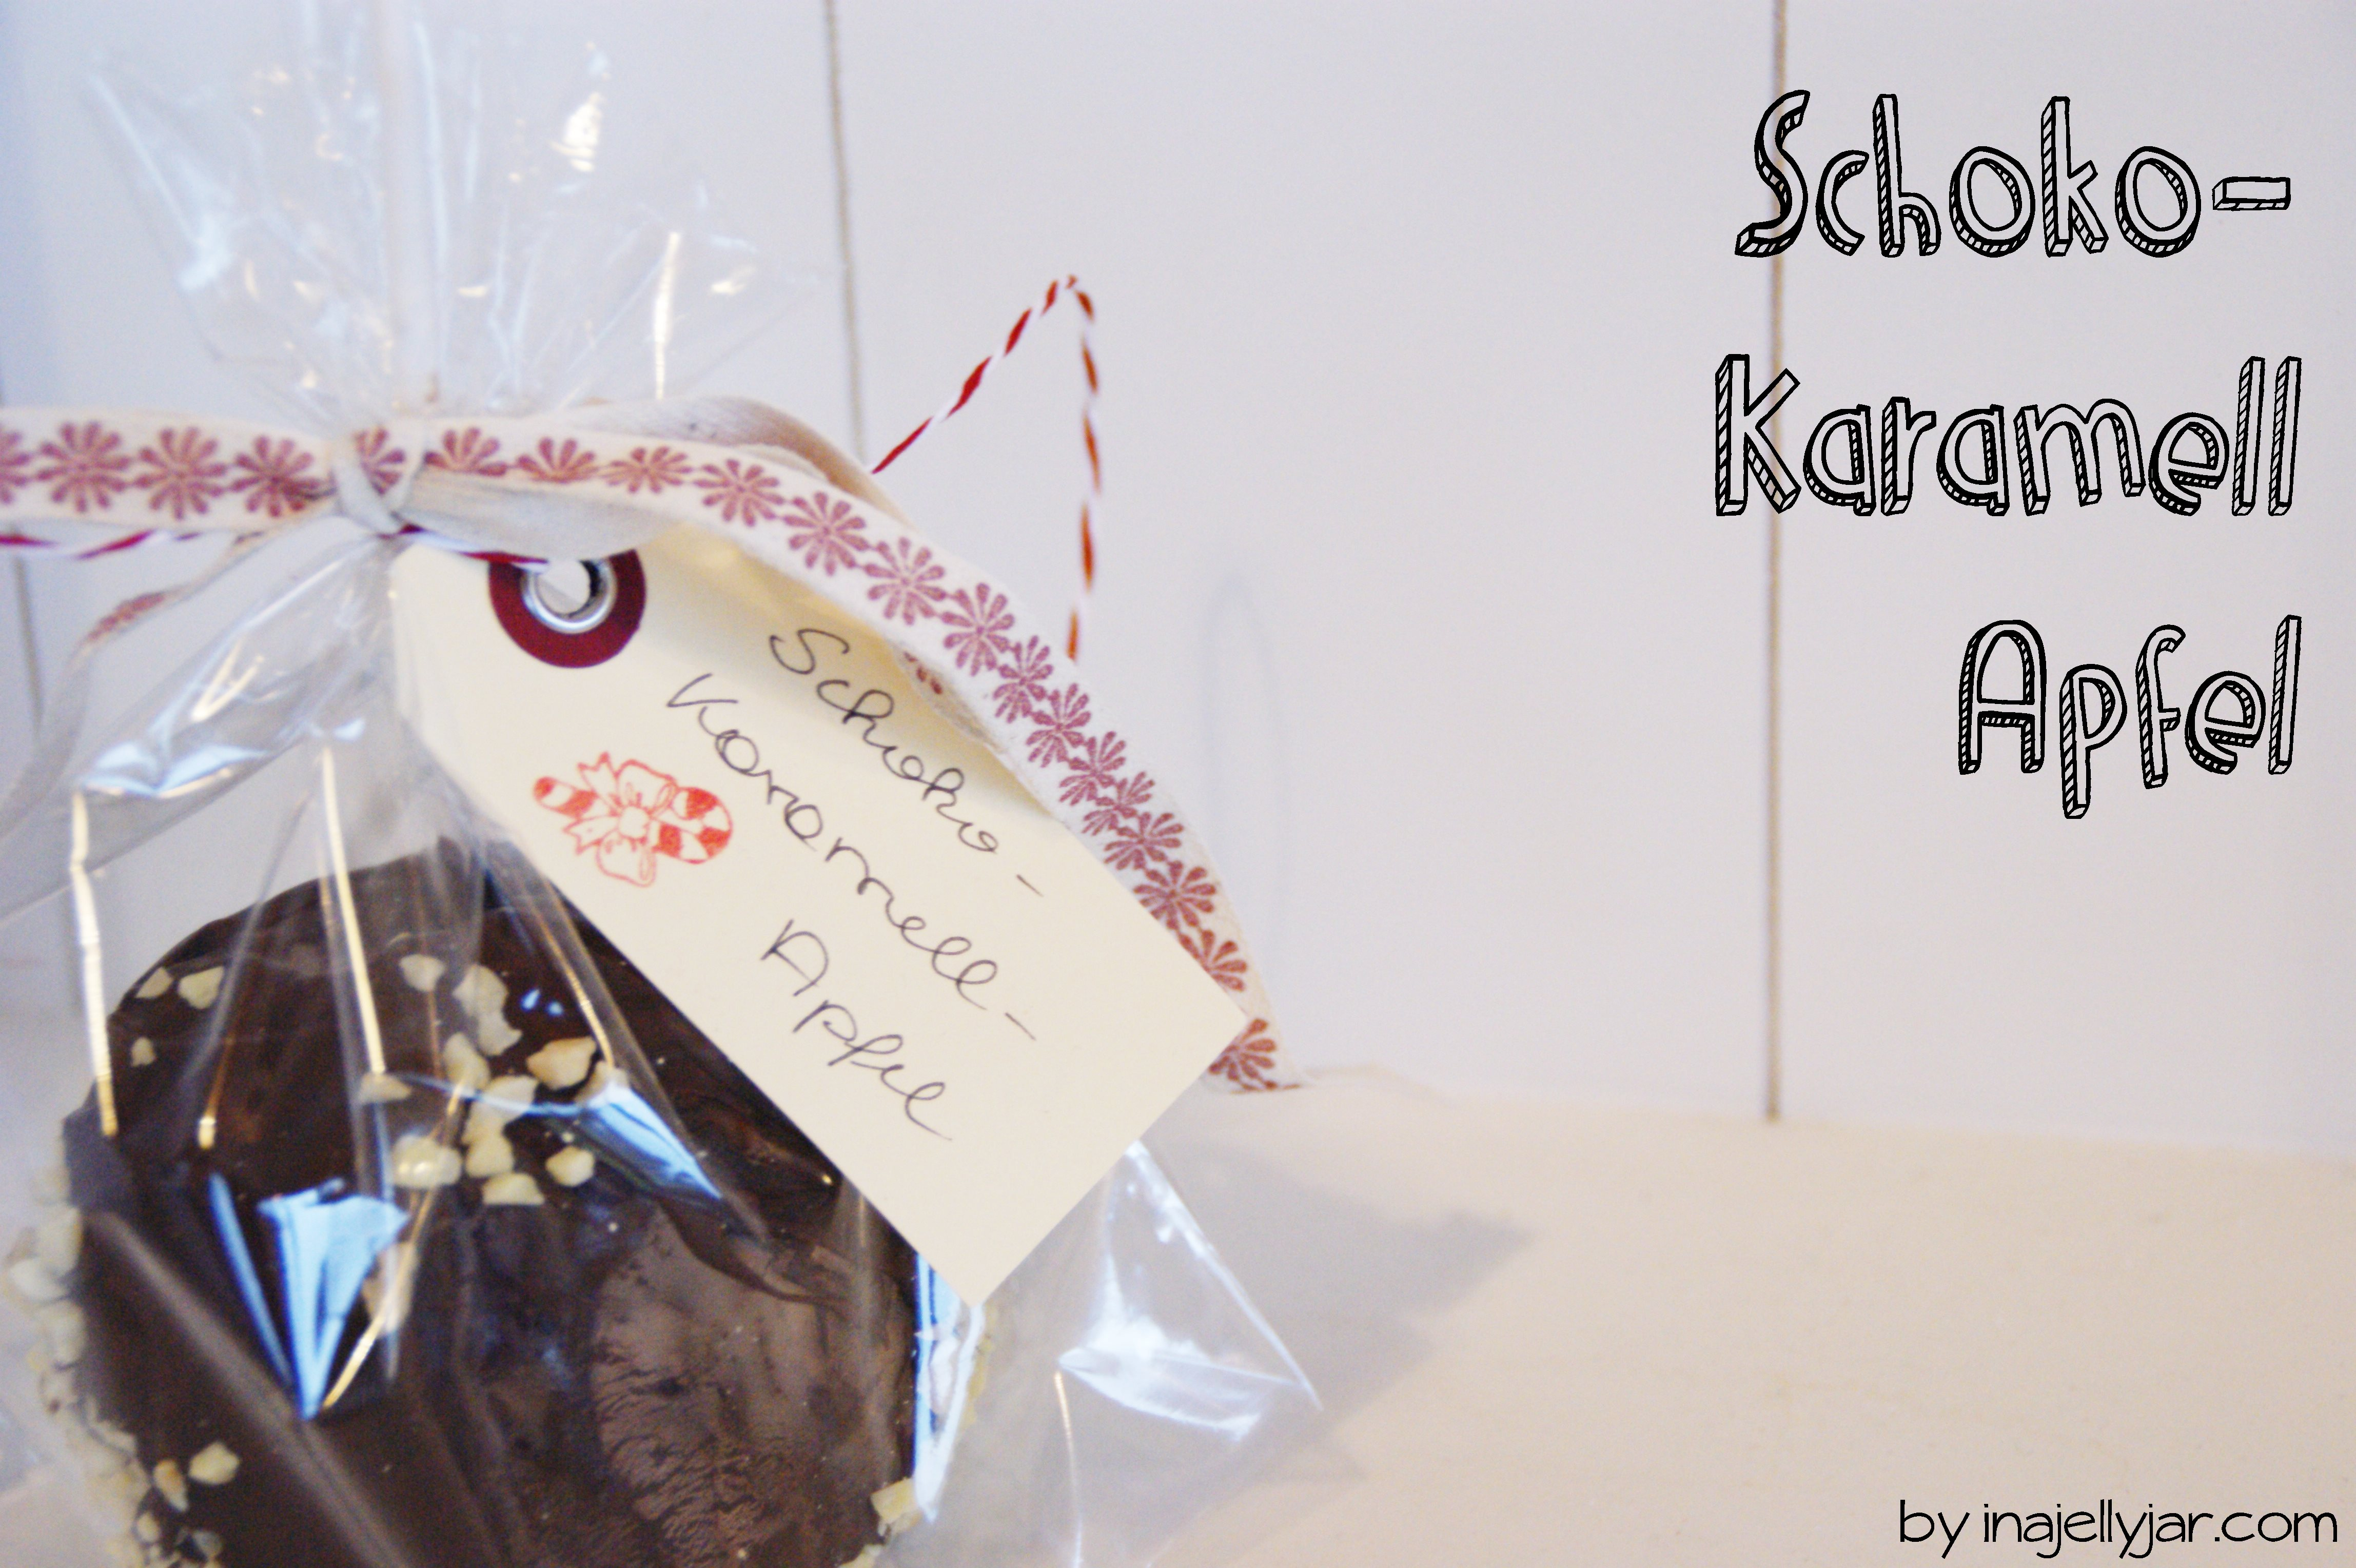 Schoko-Karamell-Apfel